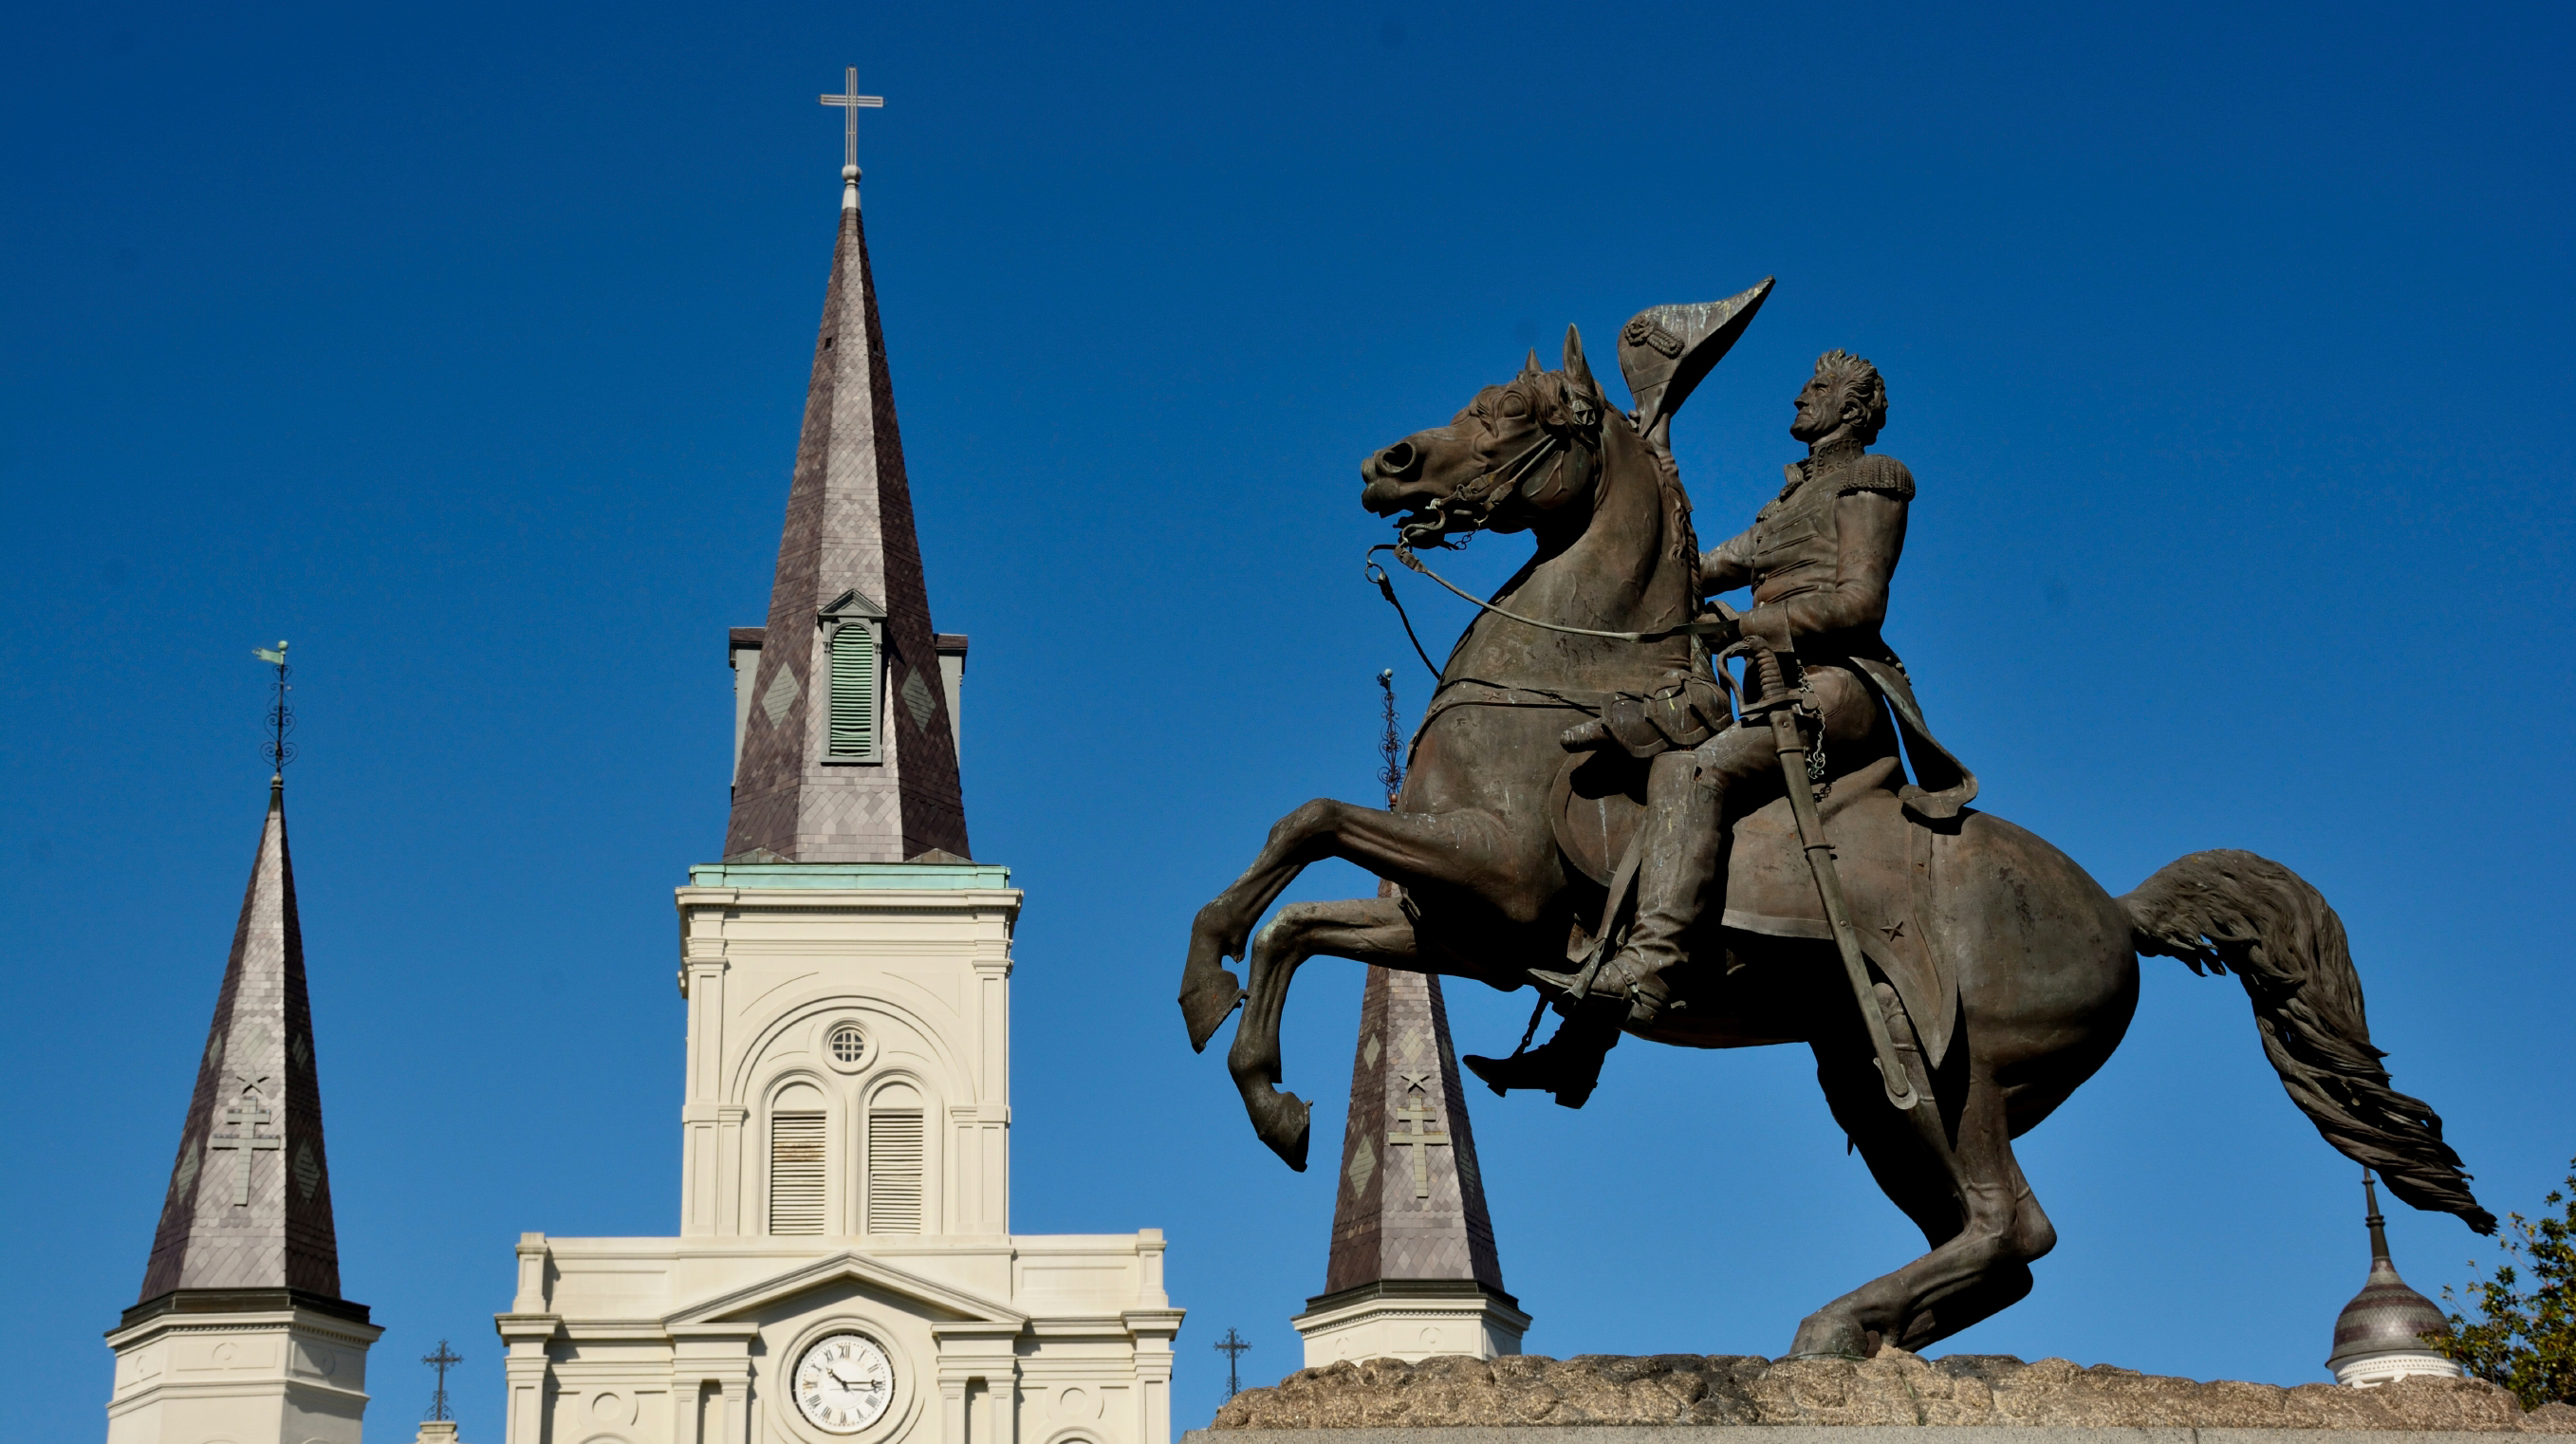 Andrew Jackson www.istockphoto.com:photo:andrew-jackson-statue-at-jackson-square-gm476461322-66018529?st=85b1f34